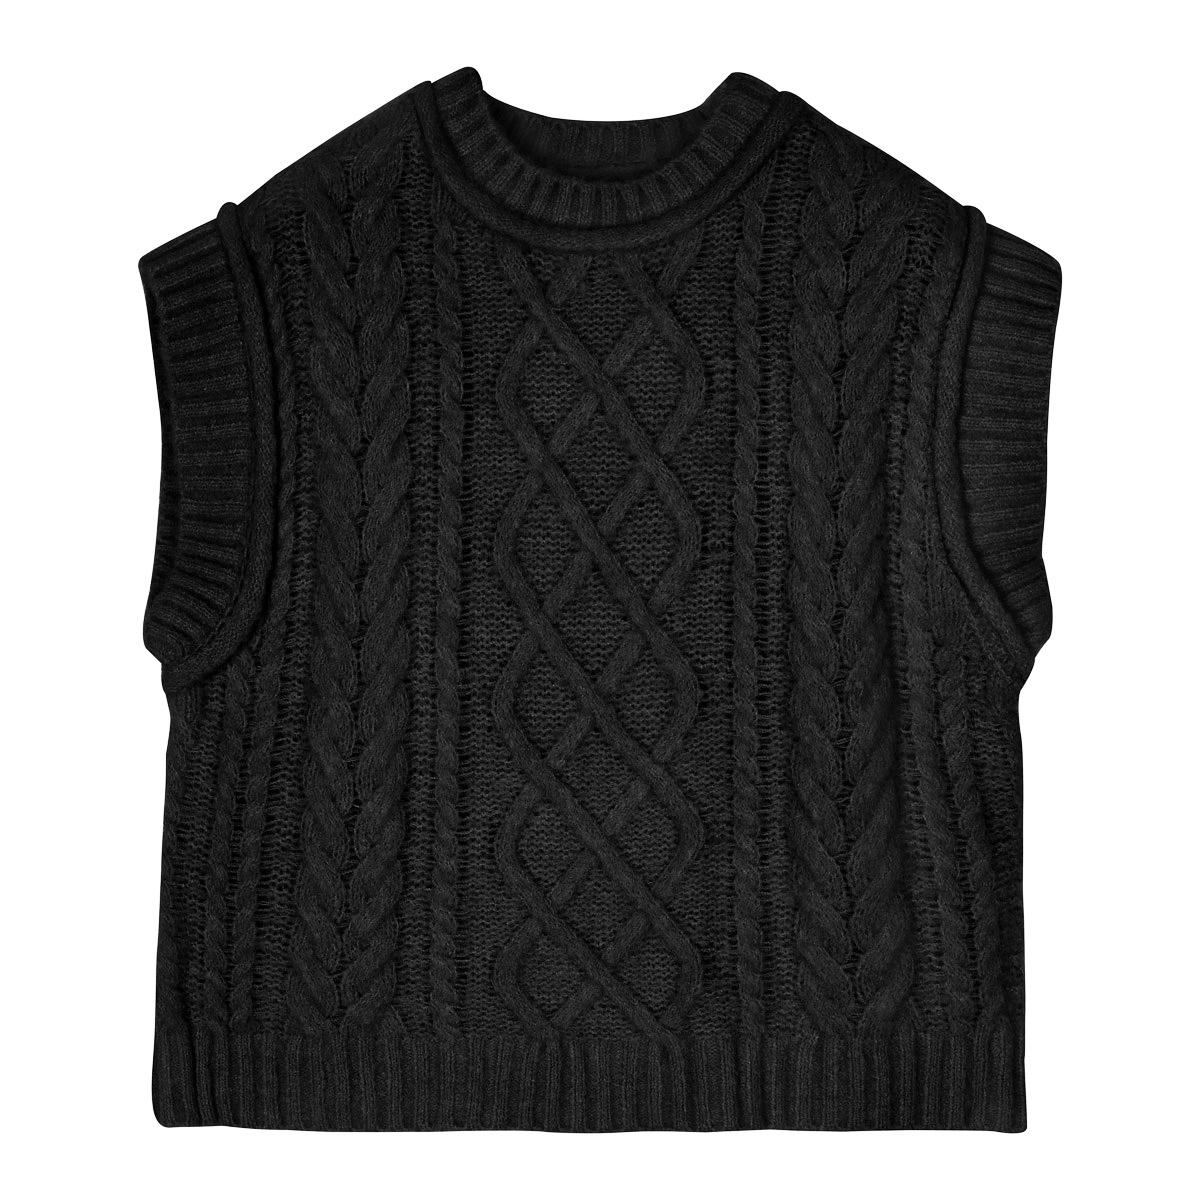 Spencer Woven Pattern